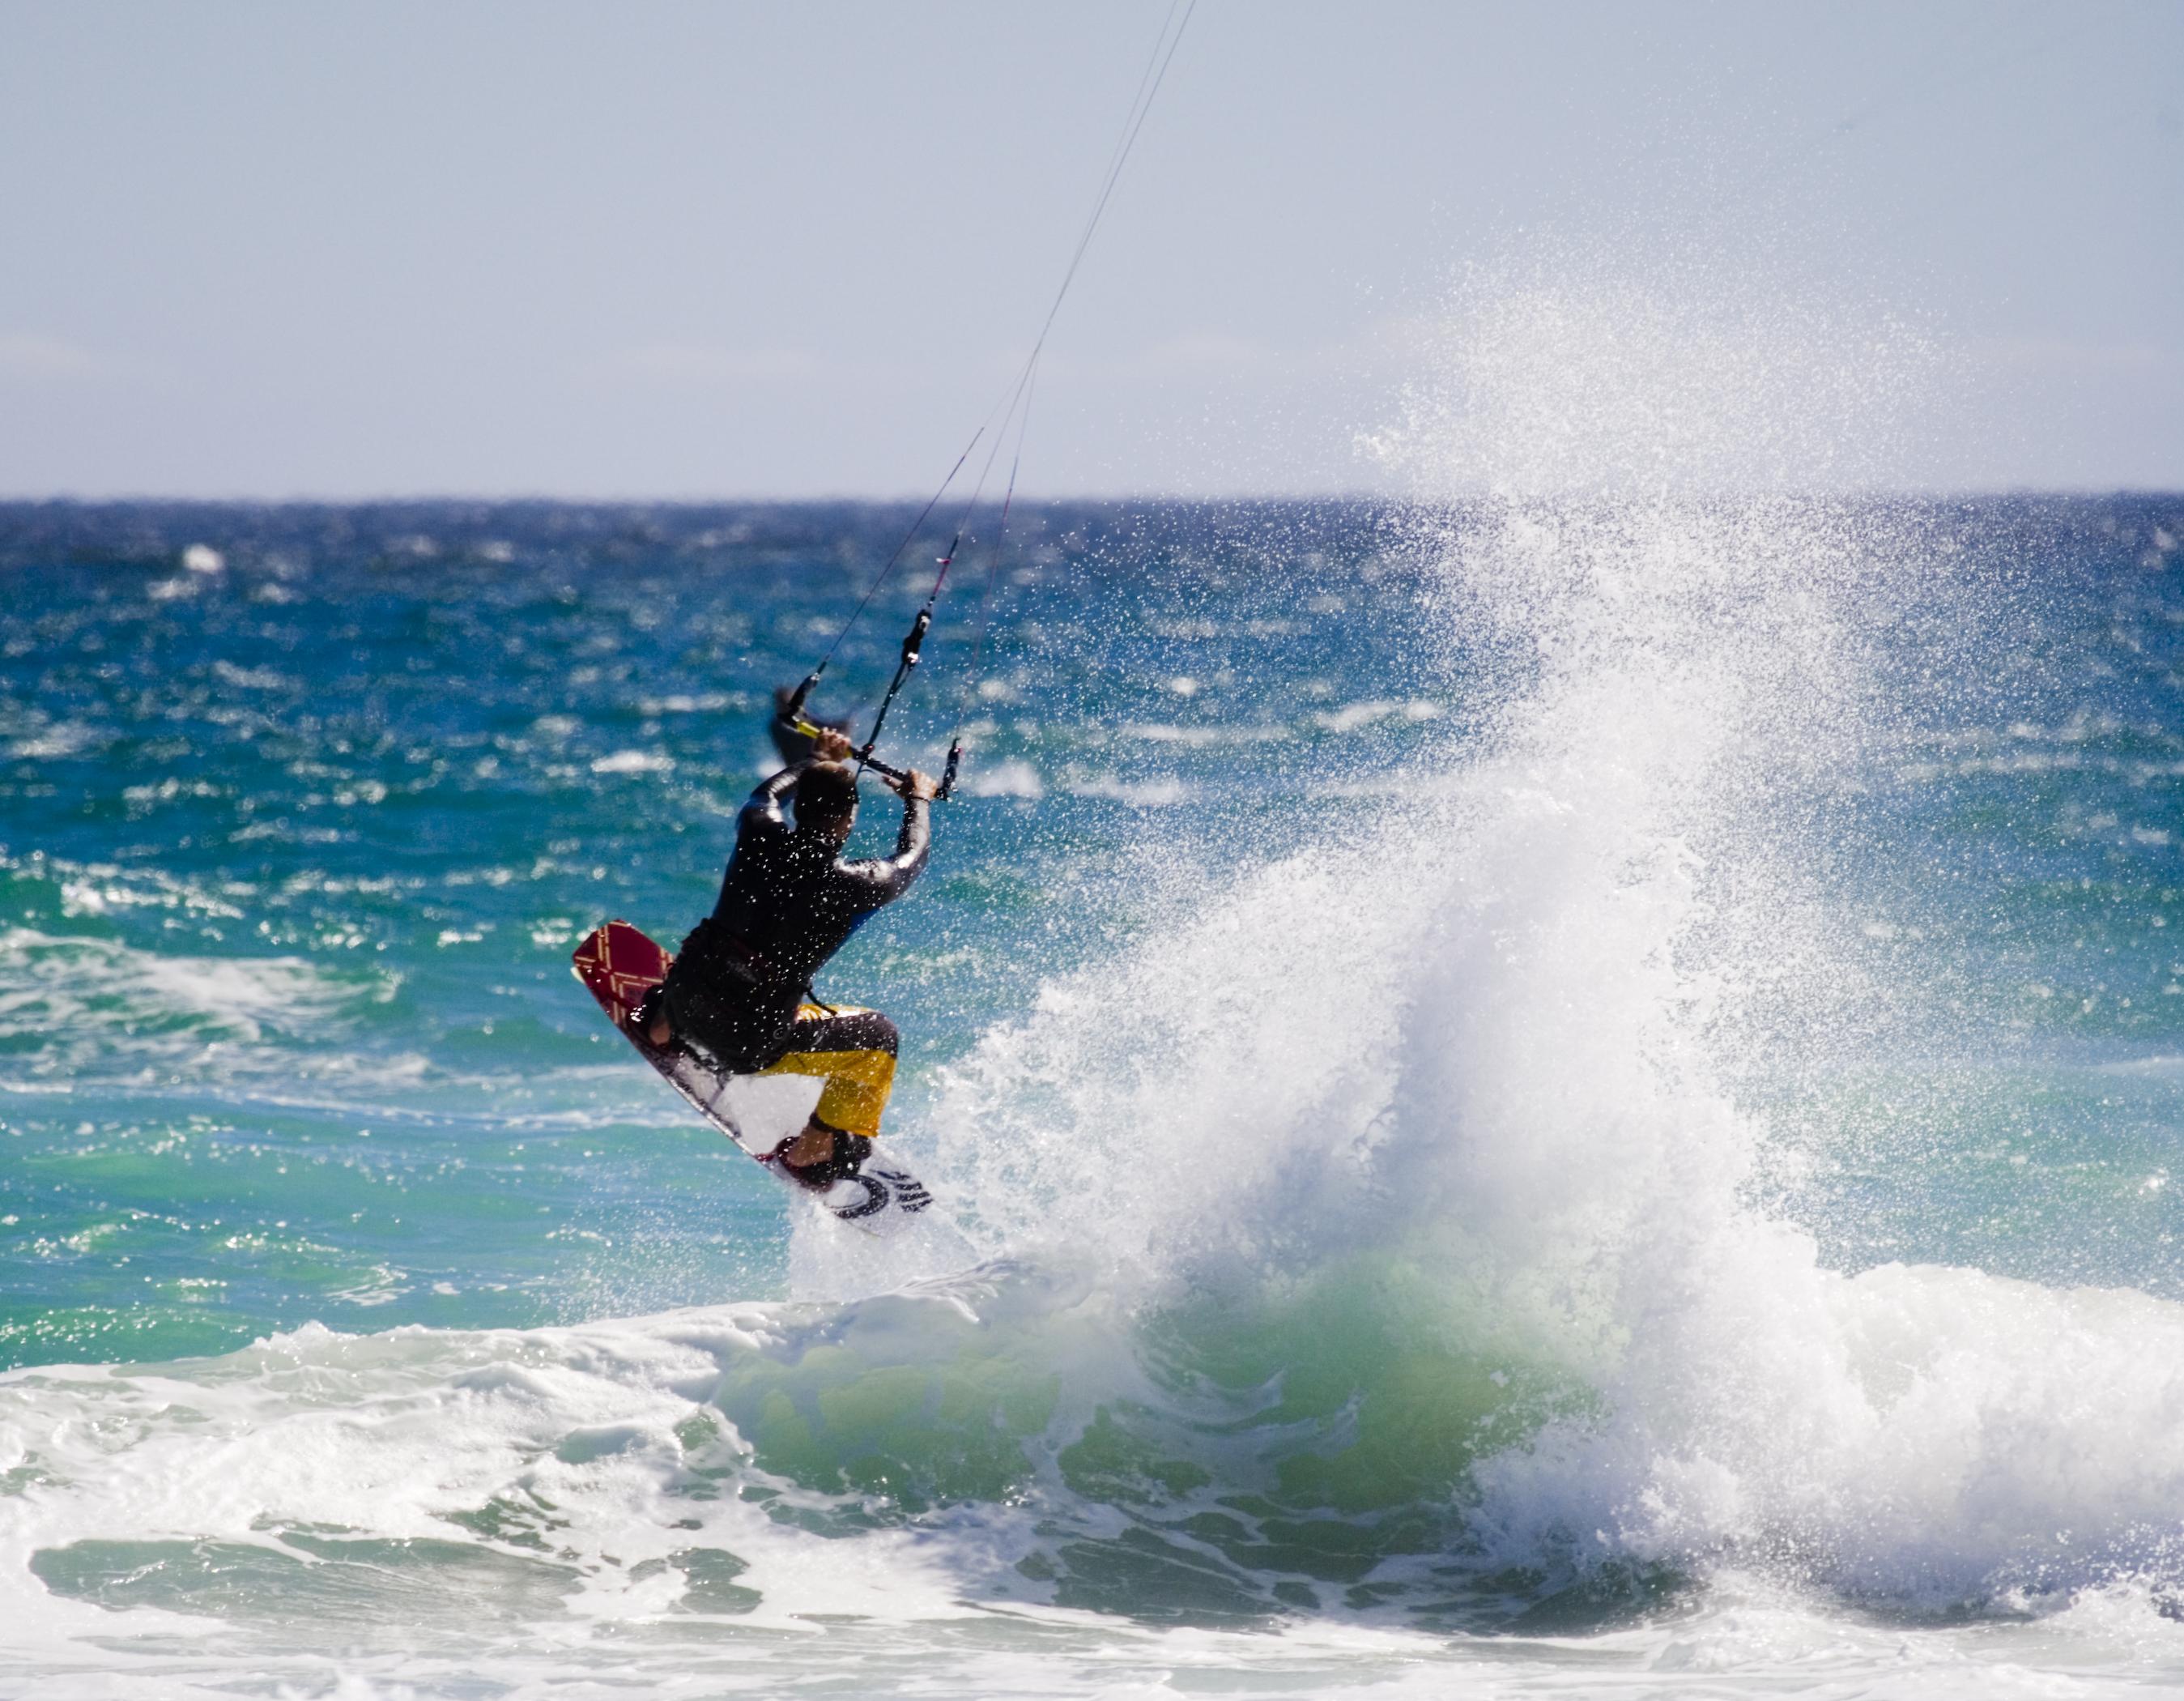 kite surfer taking off